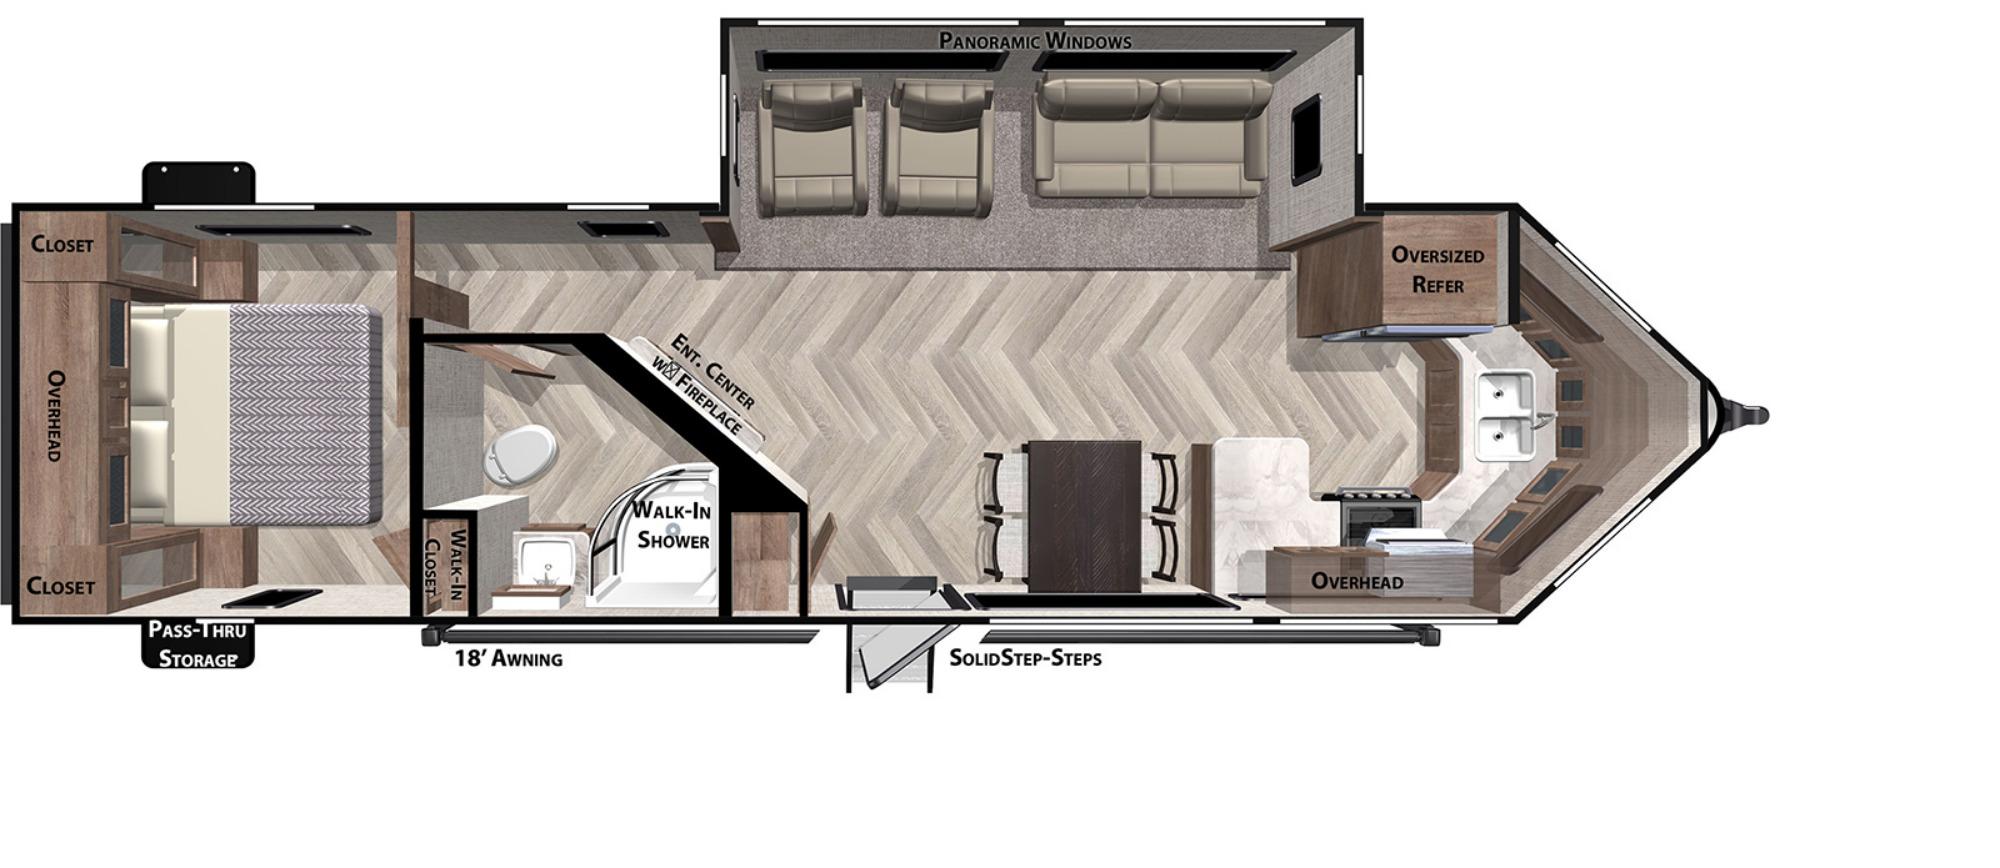 View Floor Plan for 2021 FOREST RIVER SALEM 28FKV